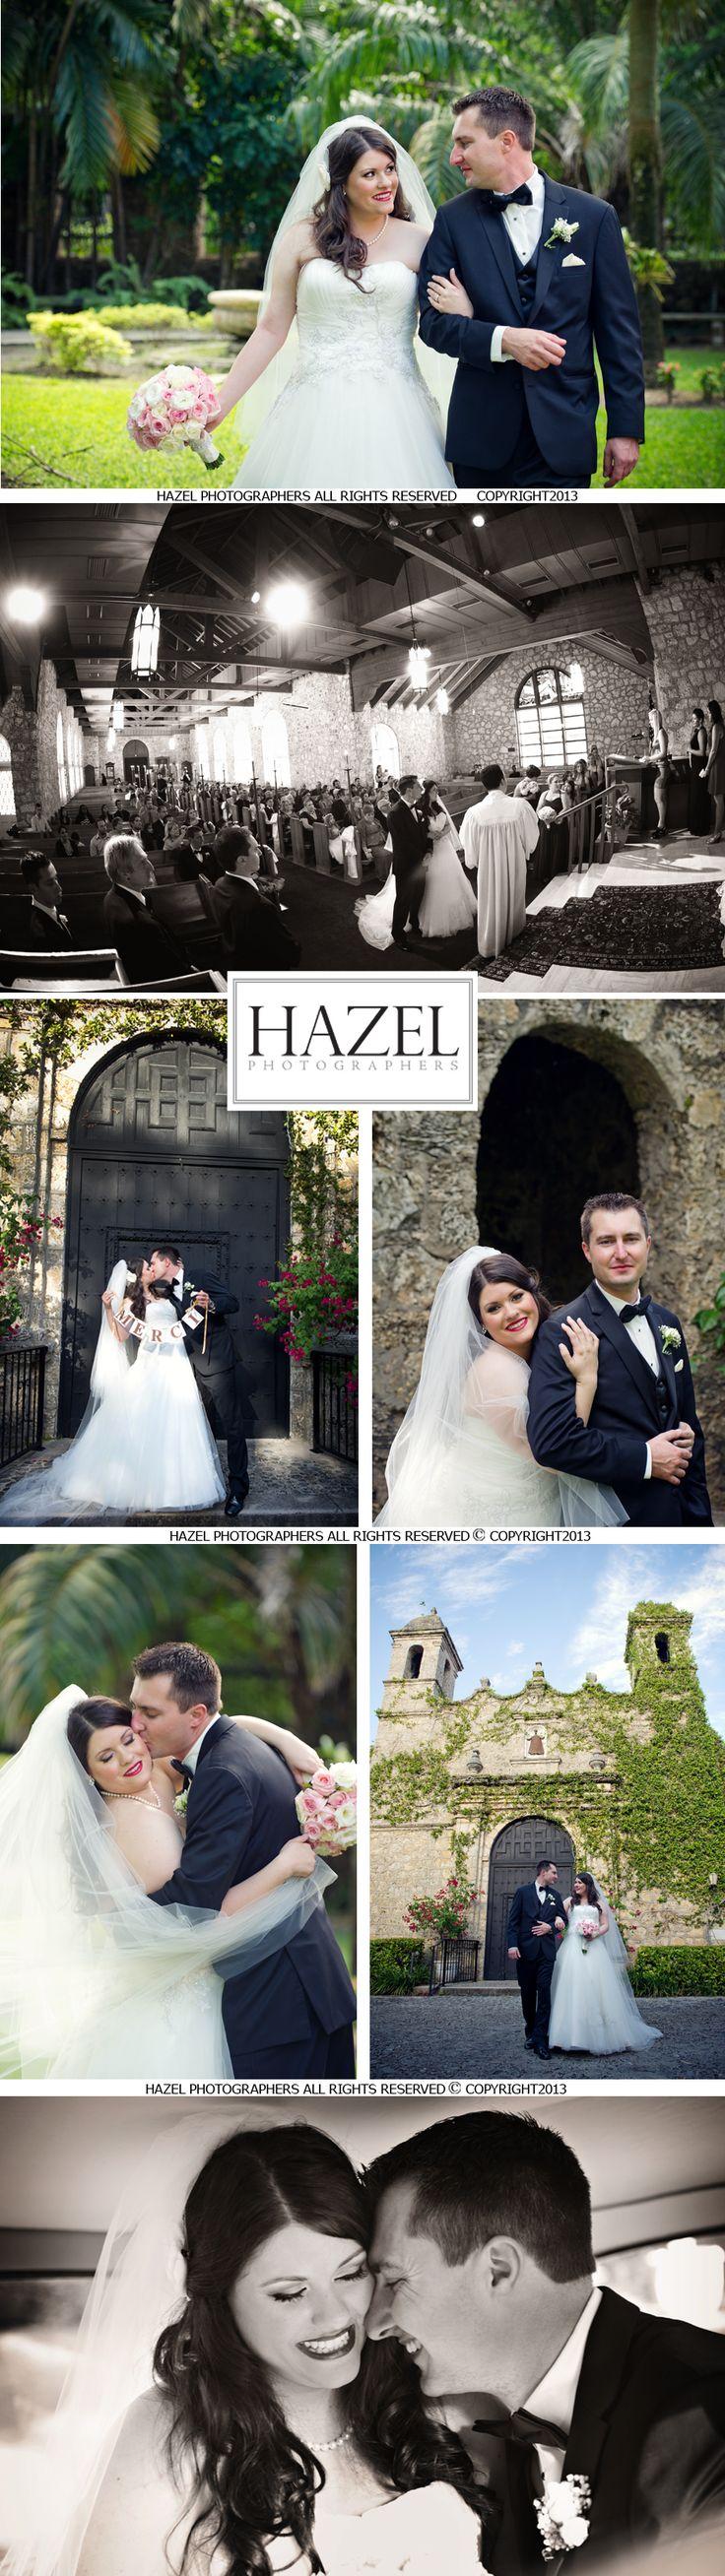 Coral Gables Plymouth Church + Sofitel Hotel Miami FL: Cristina + Pascal Wedding | Hazel Photographers Blog